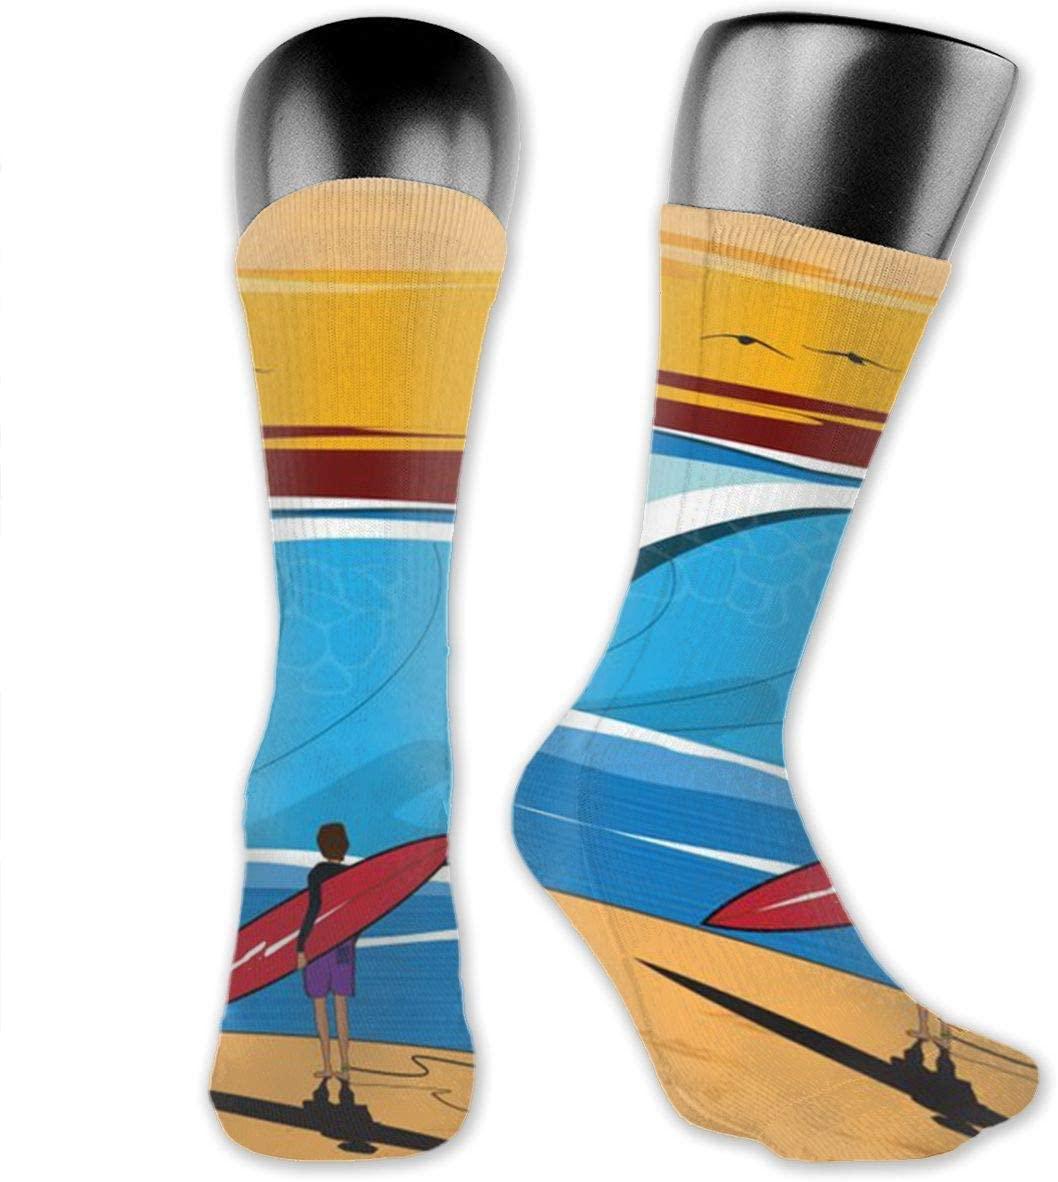 YG1BIIP Surfboard Athletic Crew Socks Compression Socks for Women Men Medical,Athletic,Knee High Graduated Calf Sock - Best for Flight,Travel,Nurses,Running,Sports